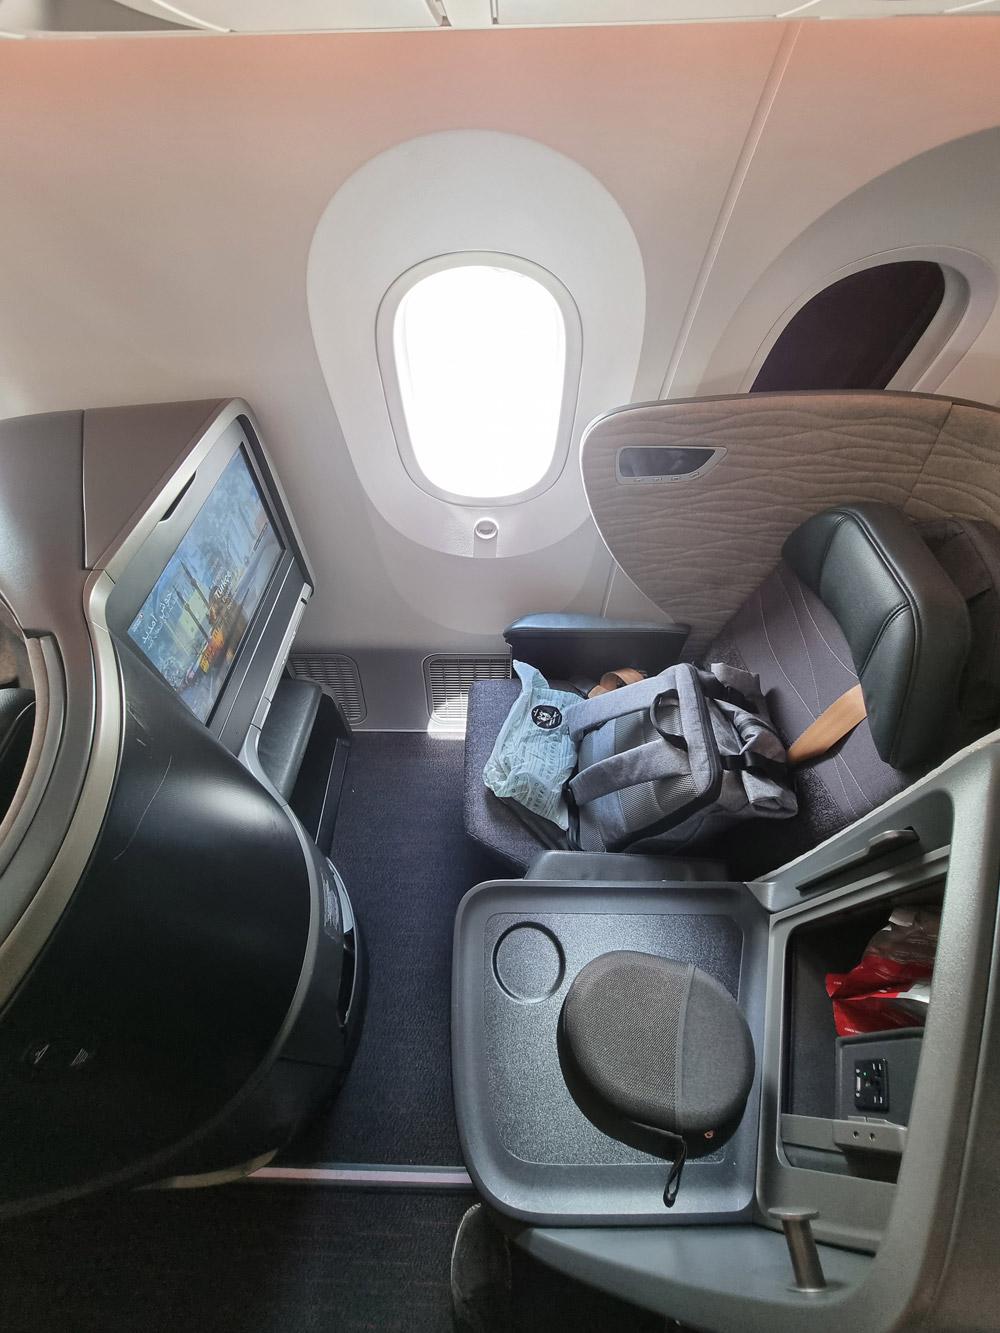 Кресло бизнес-класса в Boeing 787-9 Turkish Airlines